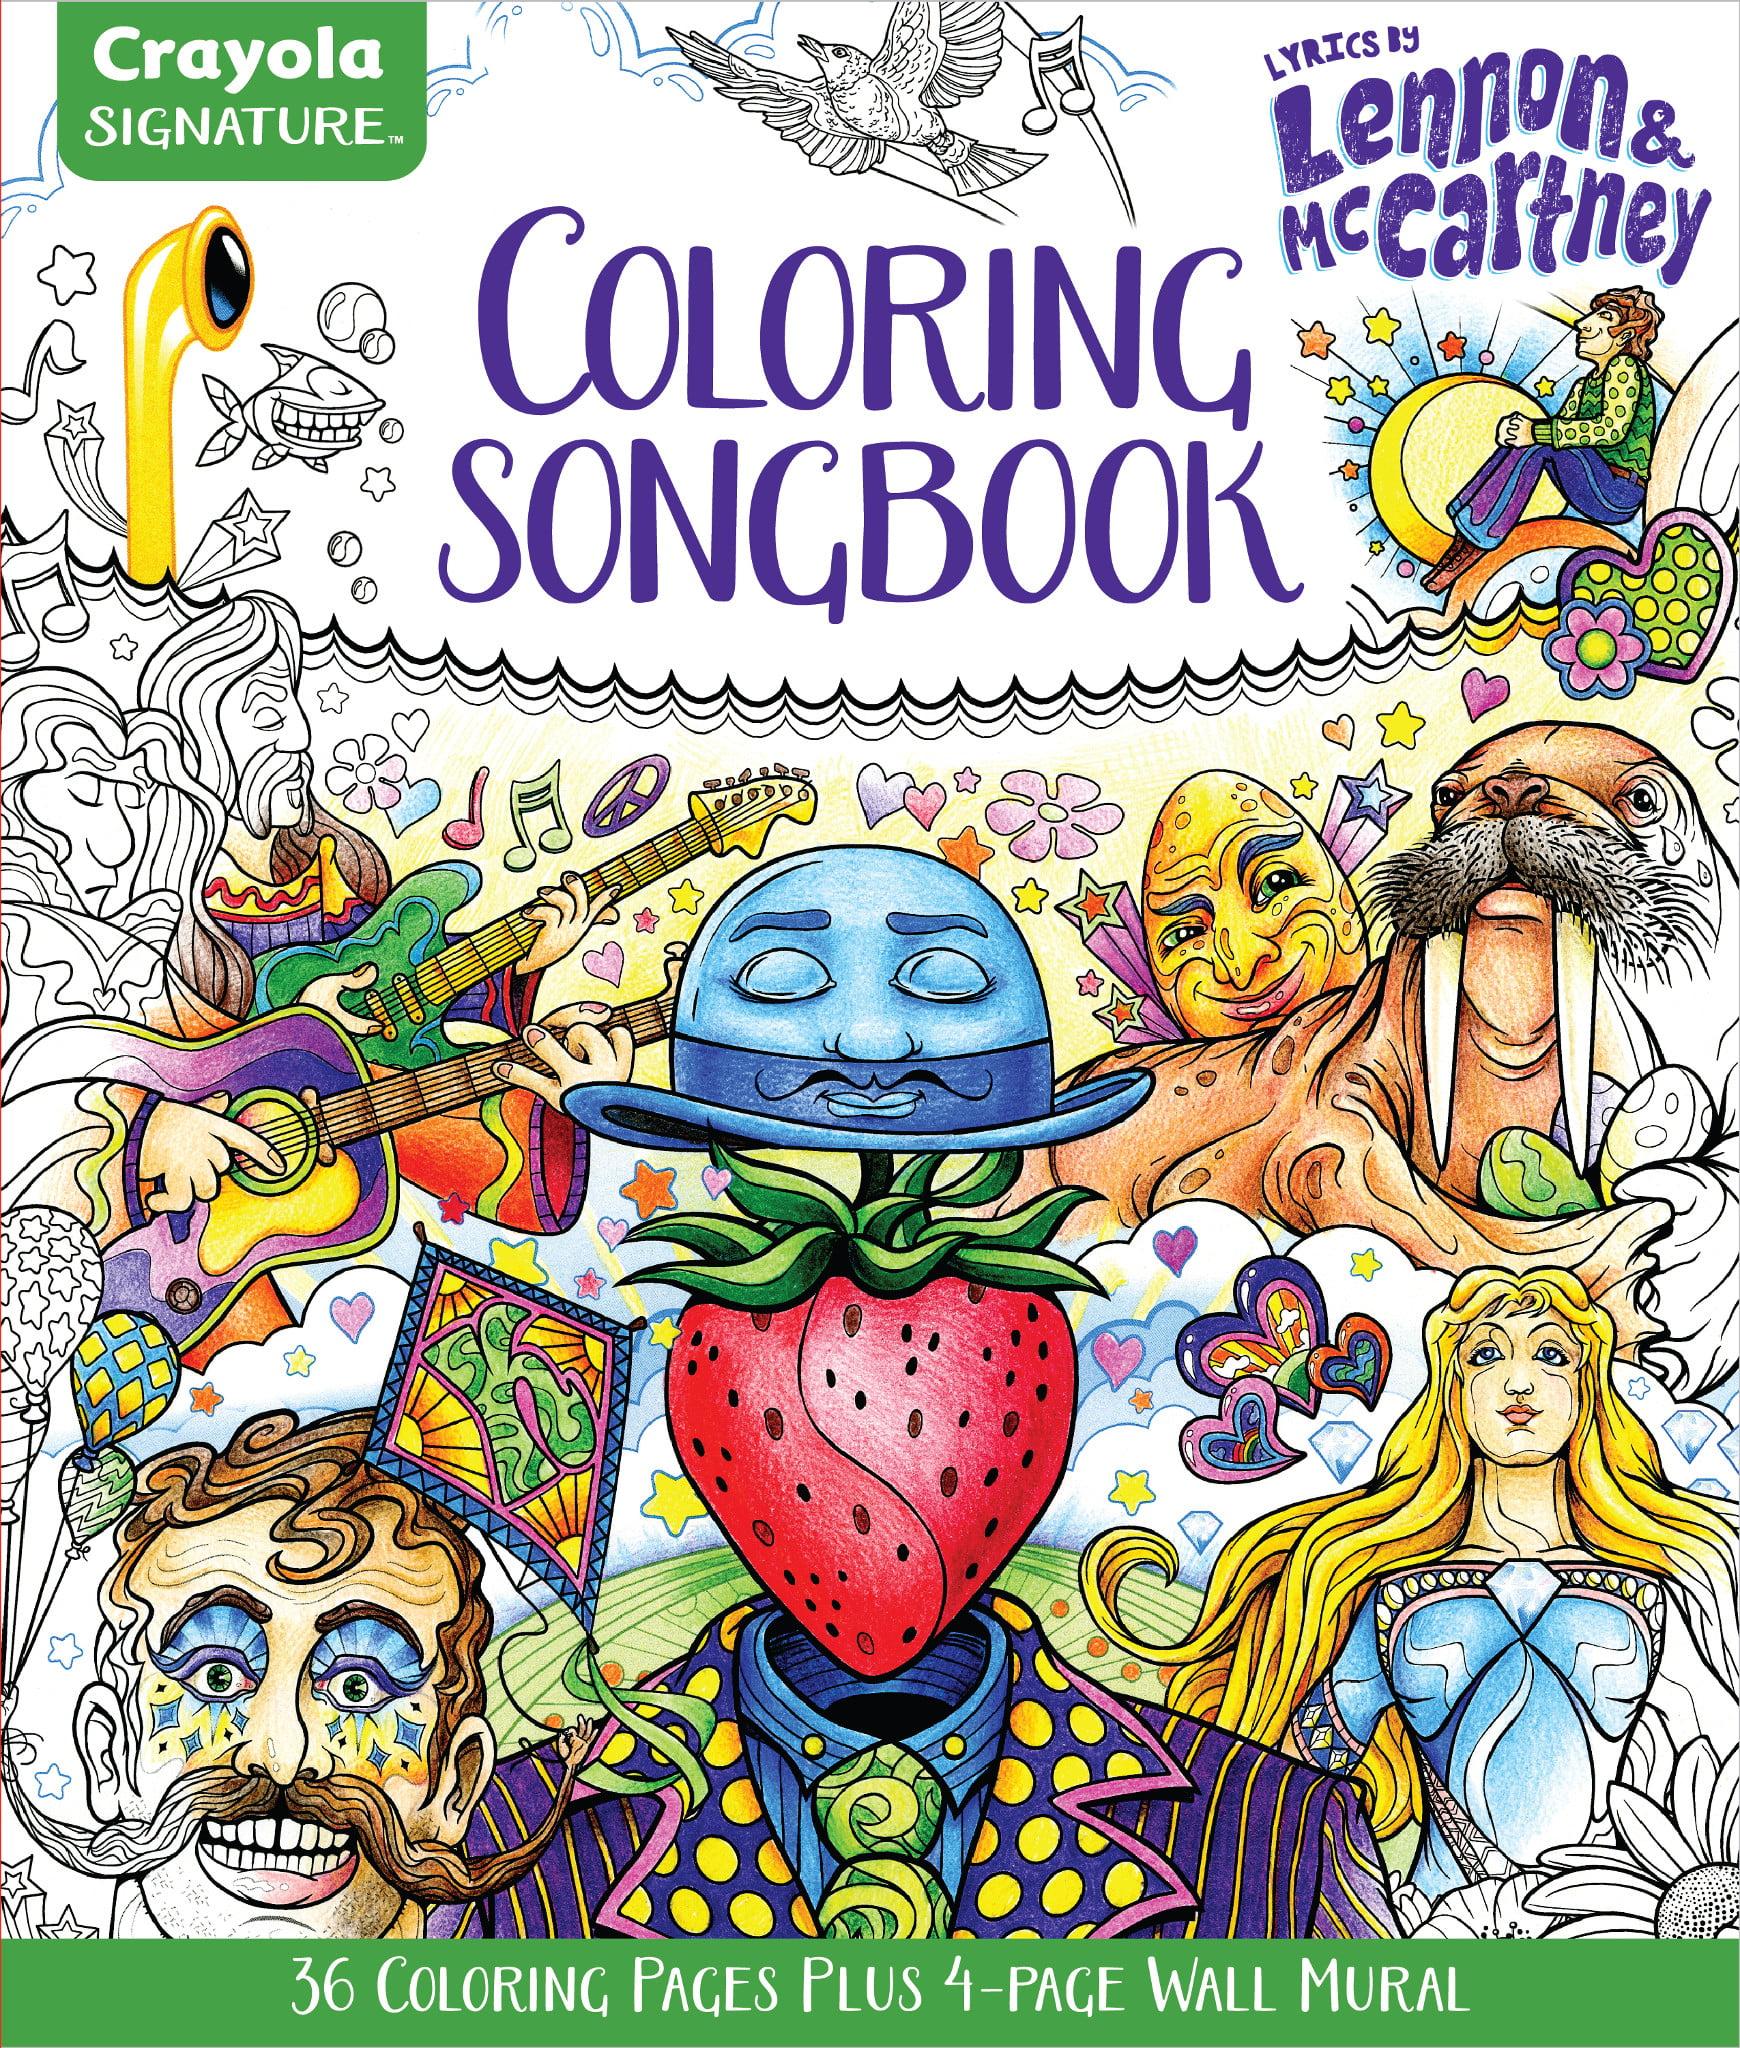 Crayola Signature Adult Coloring Pages Lennon And McCartney Lyrics And Line  Art - Walmart.com - Walmart.com